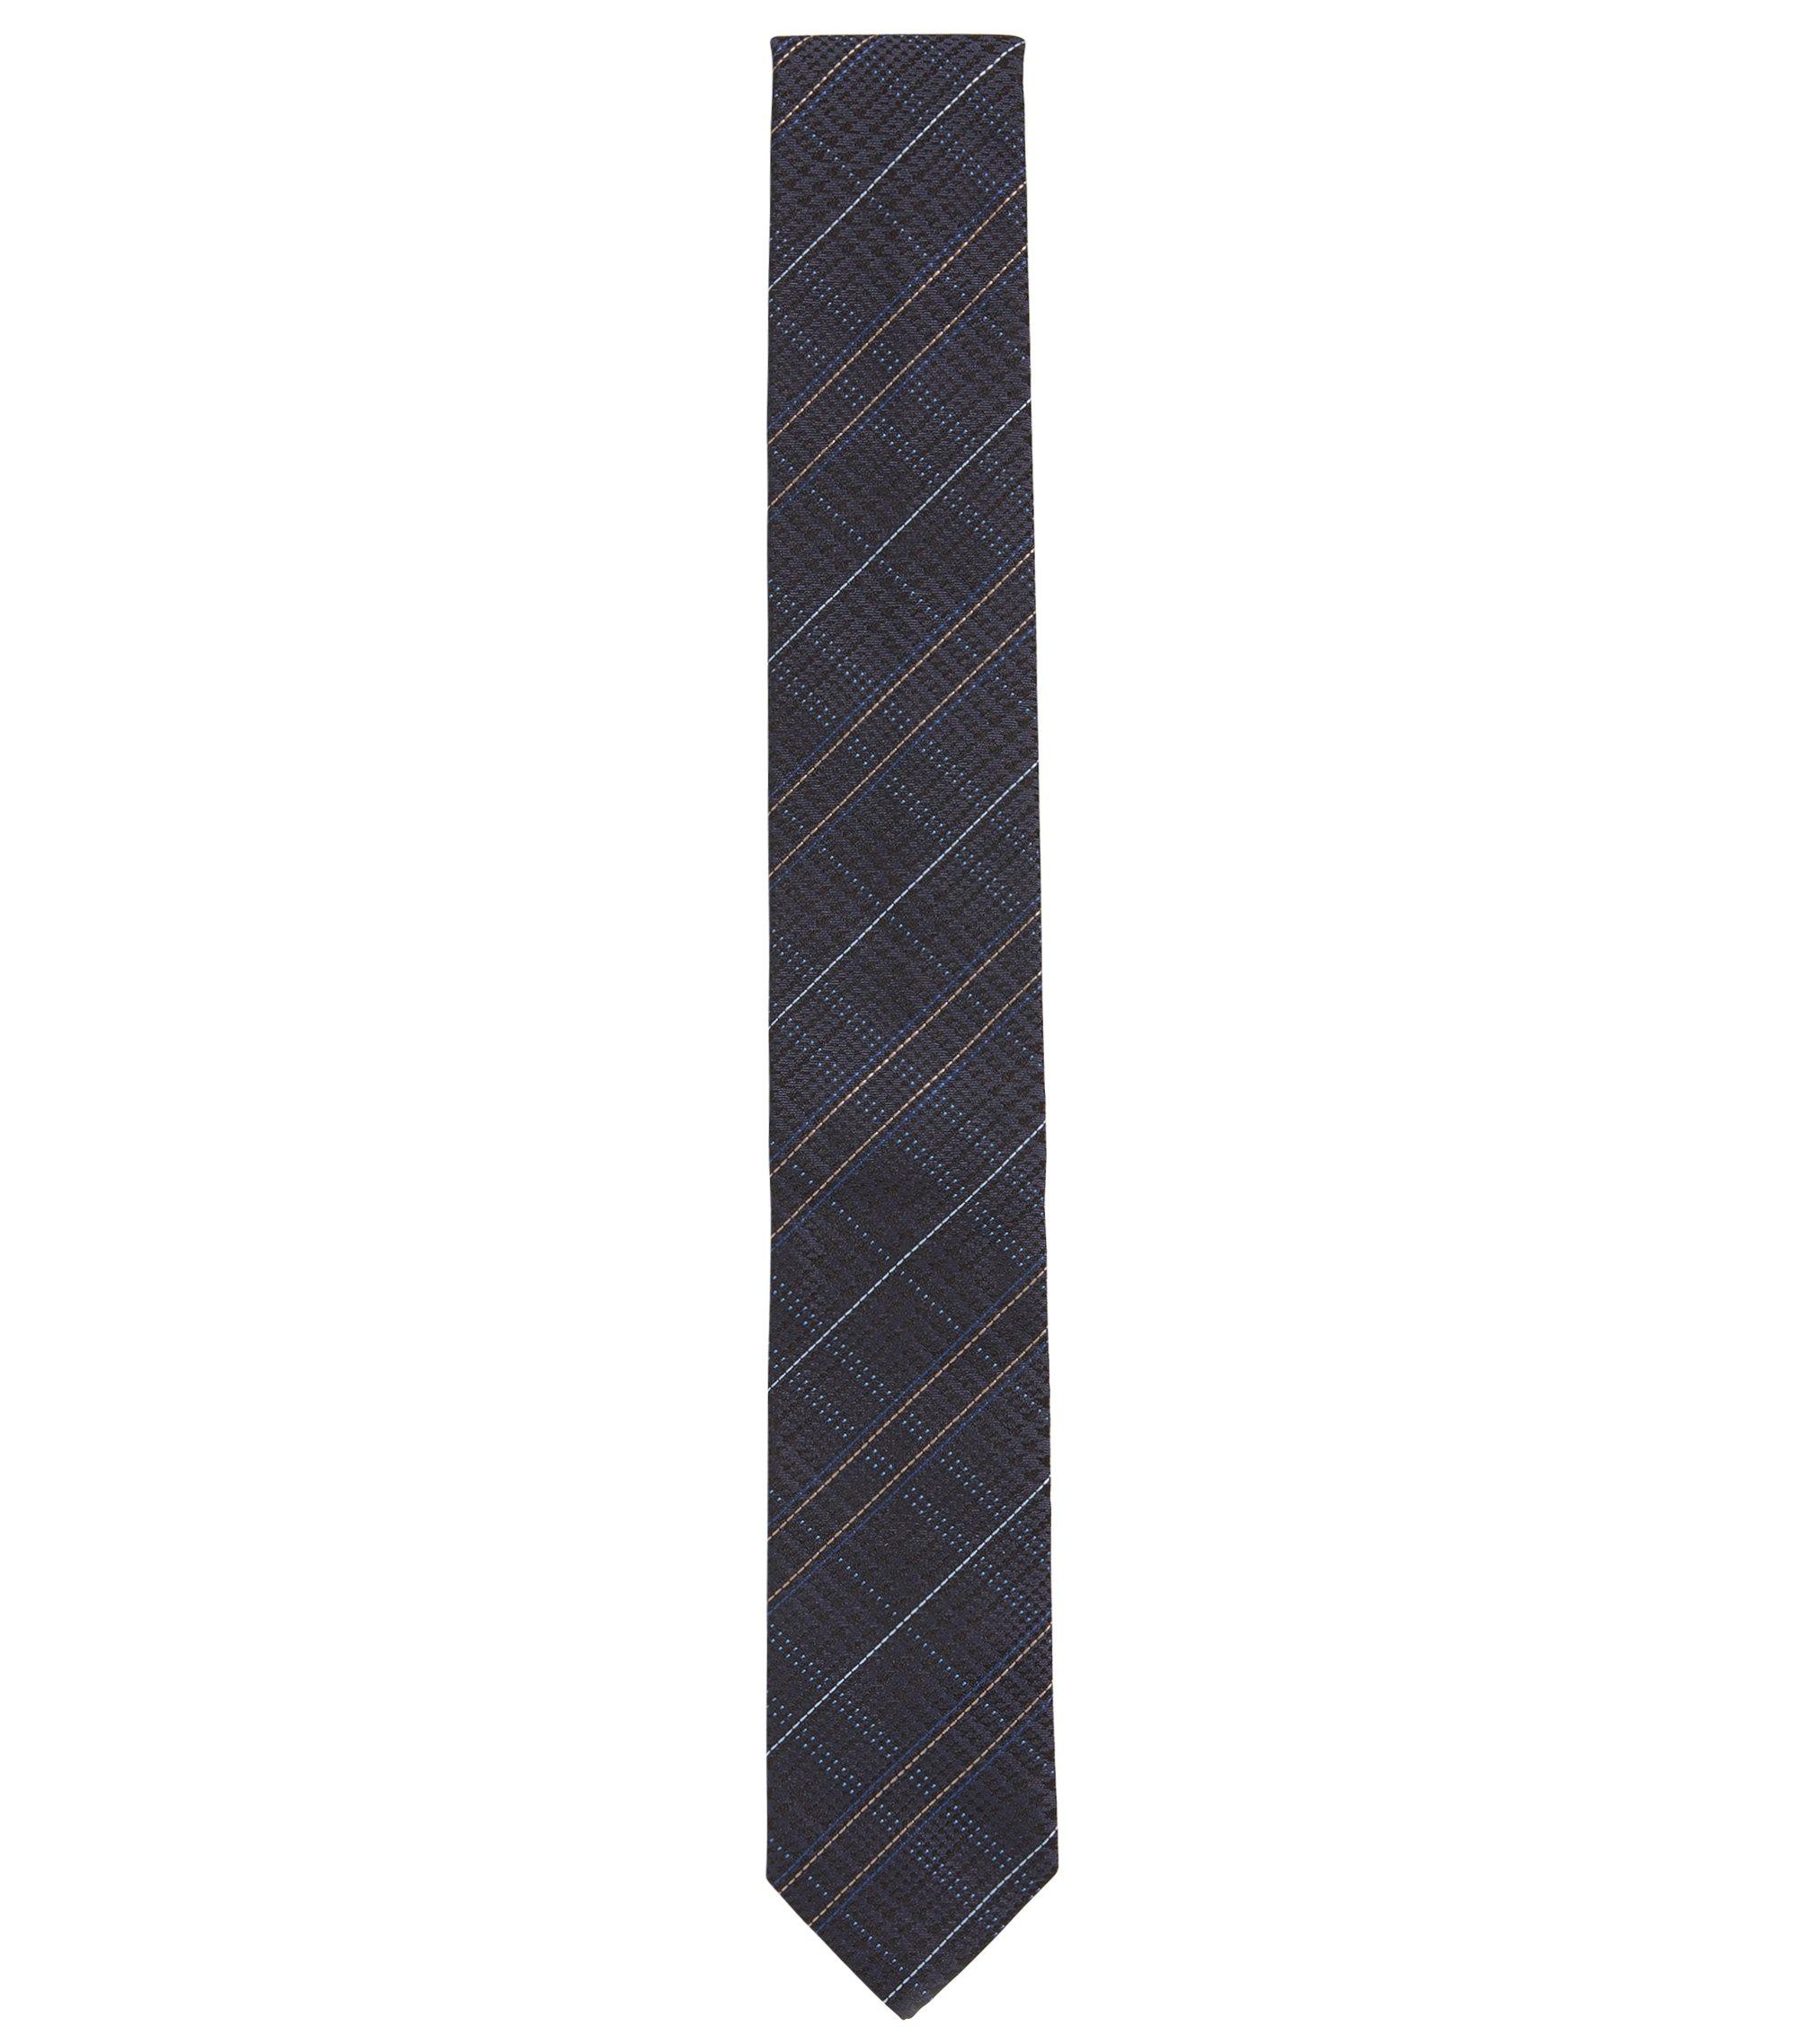 Krawatte aus Seiden-Jacquard mit Glencheck-Karo, Dunkelblau